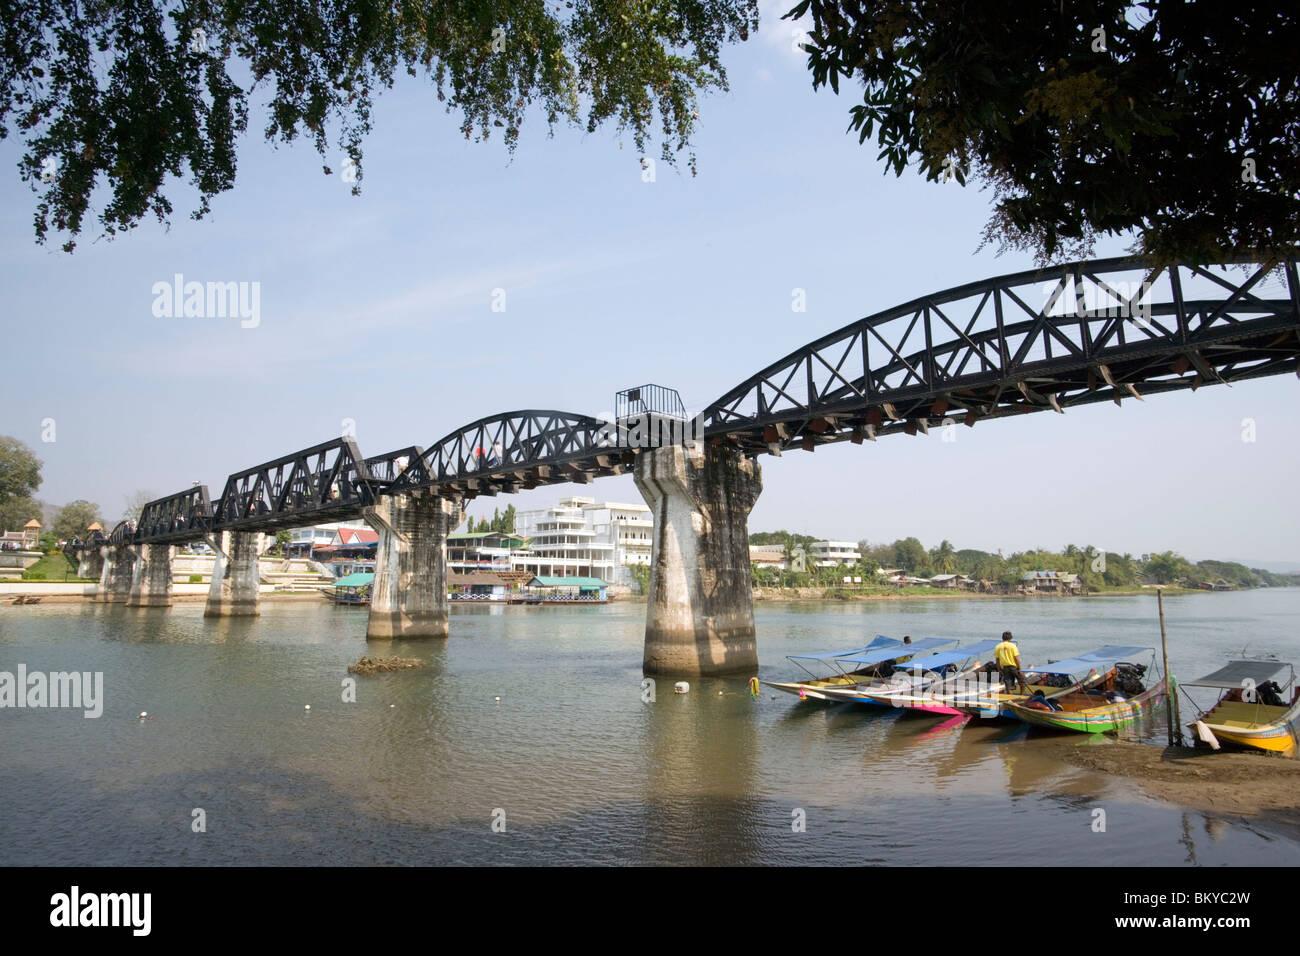 View to the River Kwai Bridge, built by prisoners of World War II of the Japanese, Kanchanaburi, Thailand - Stock Image